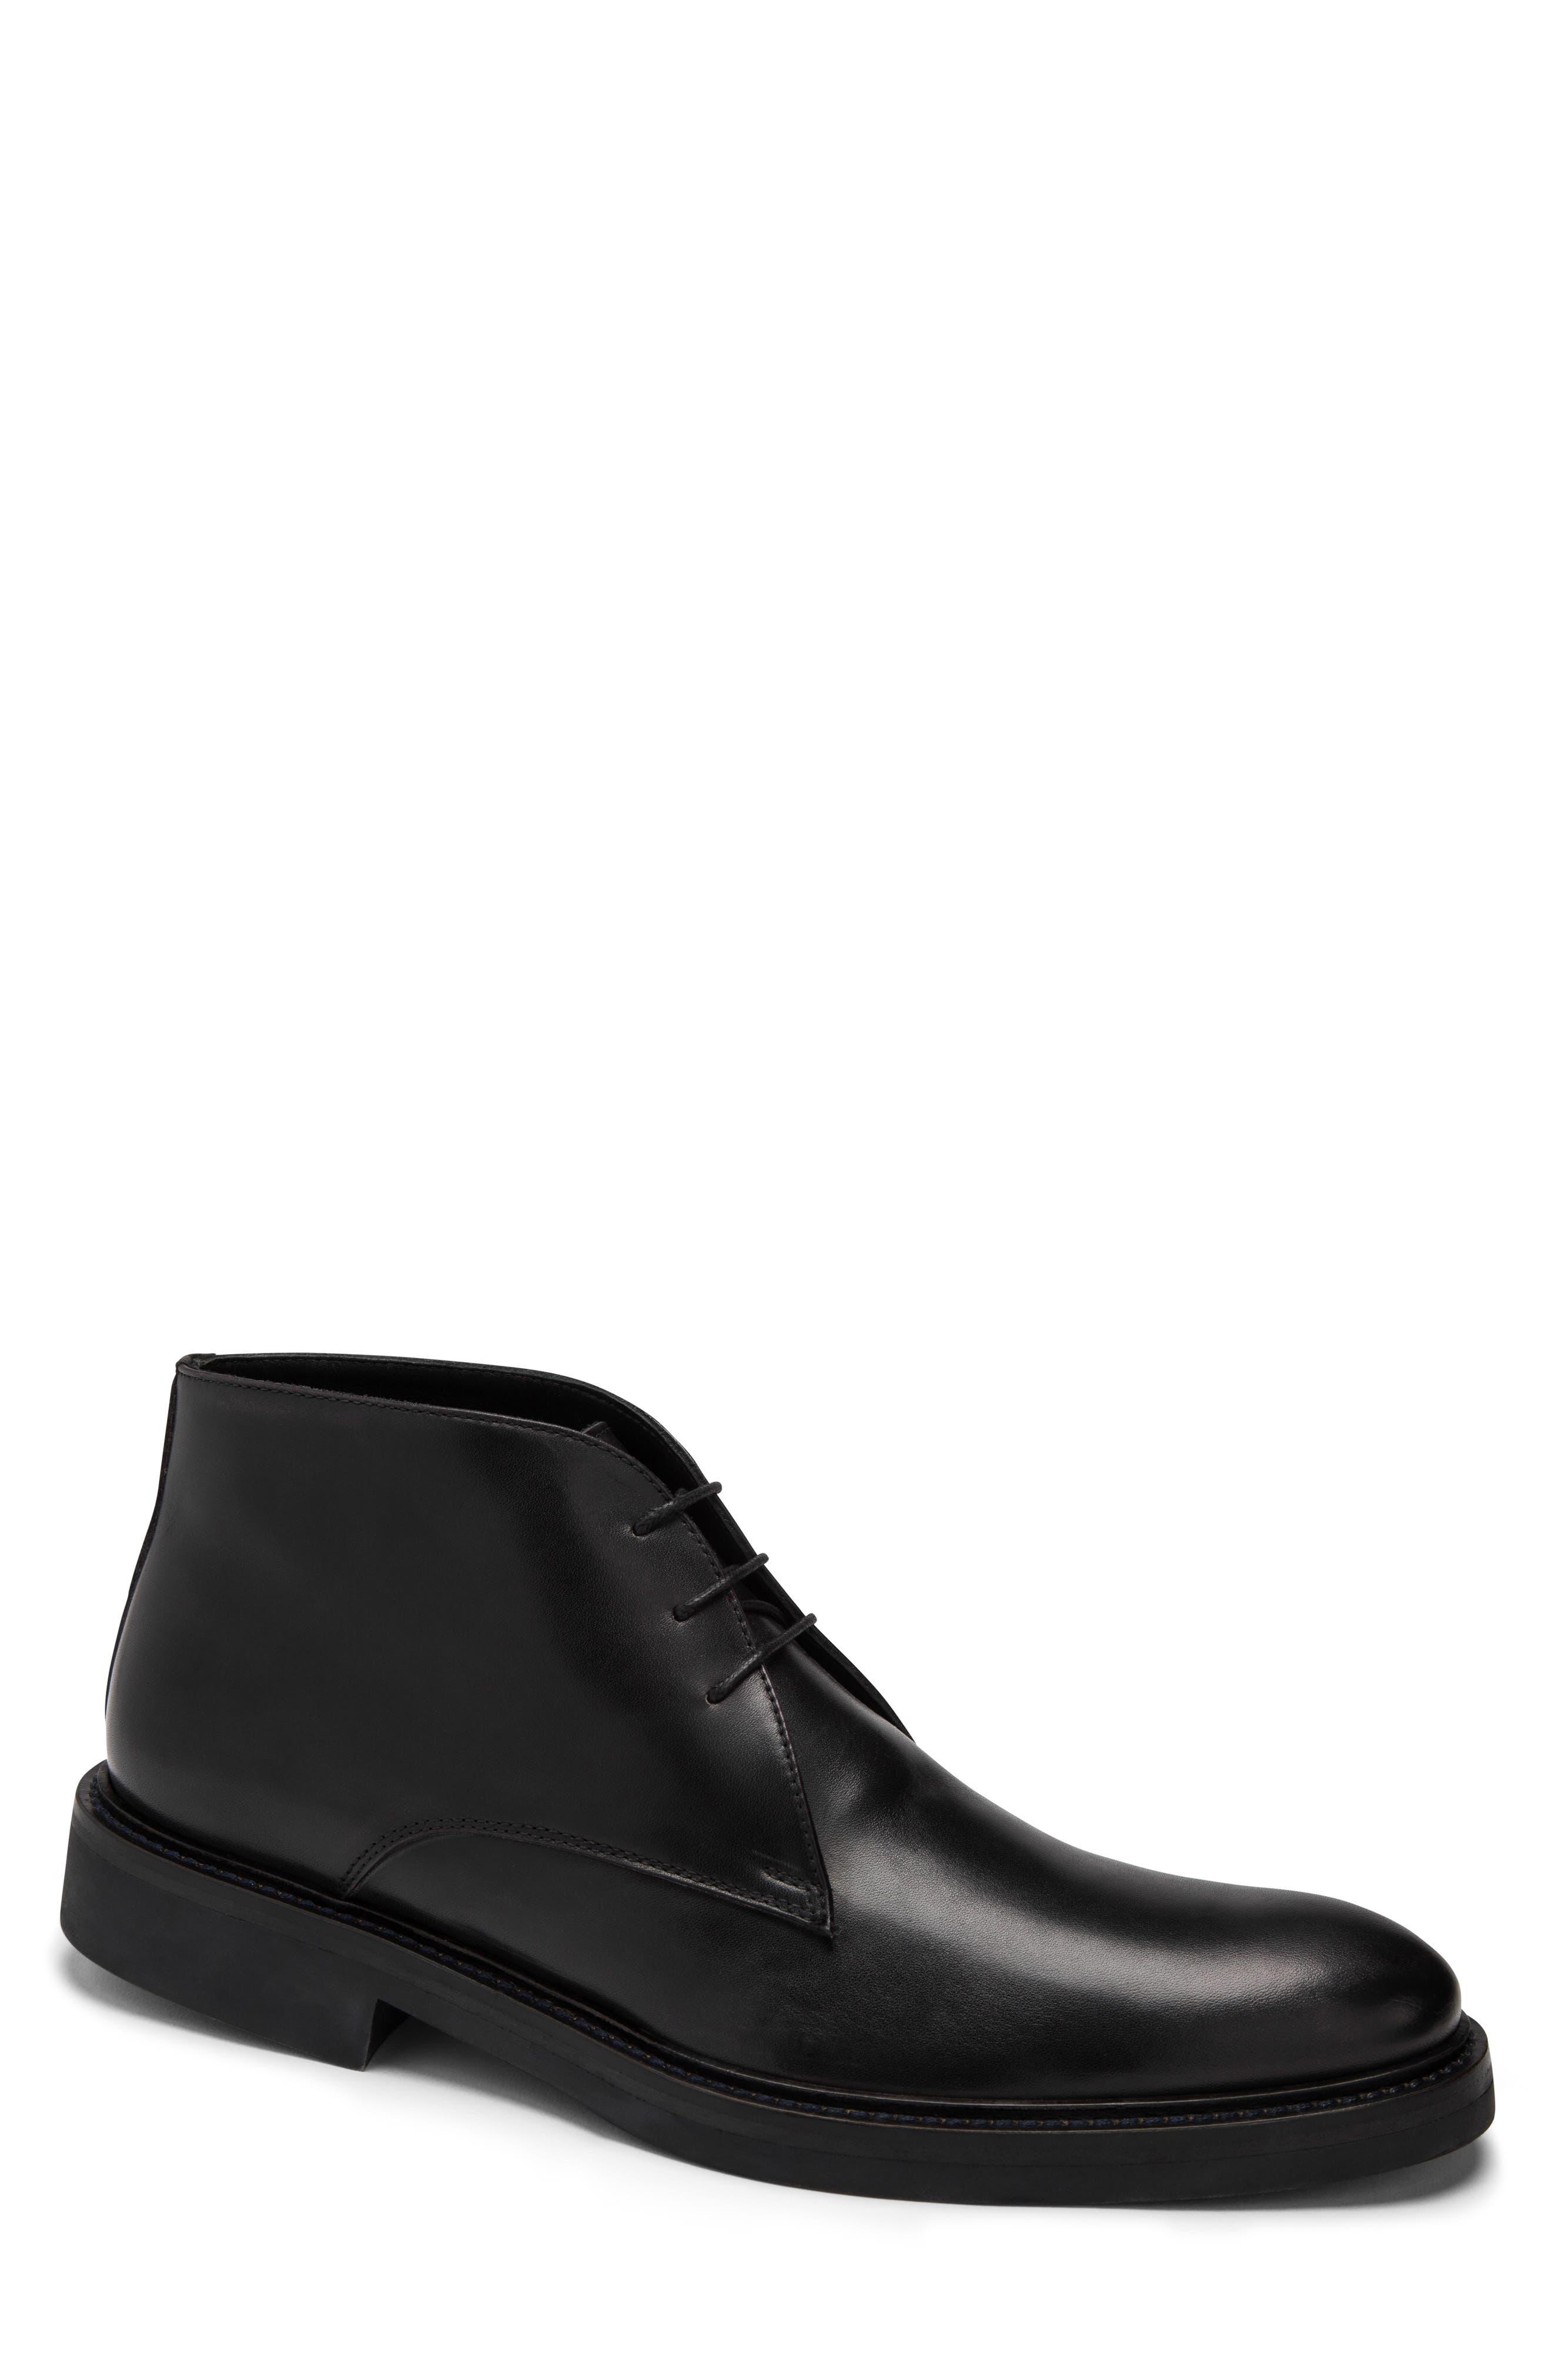 Bugatchi Milano Chukka Boot- Black